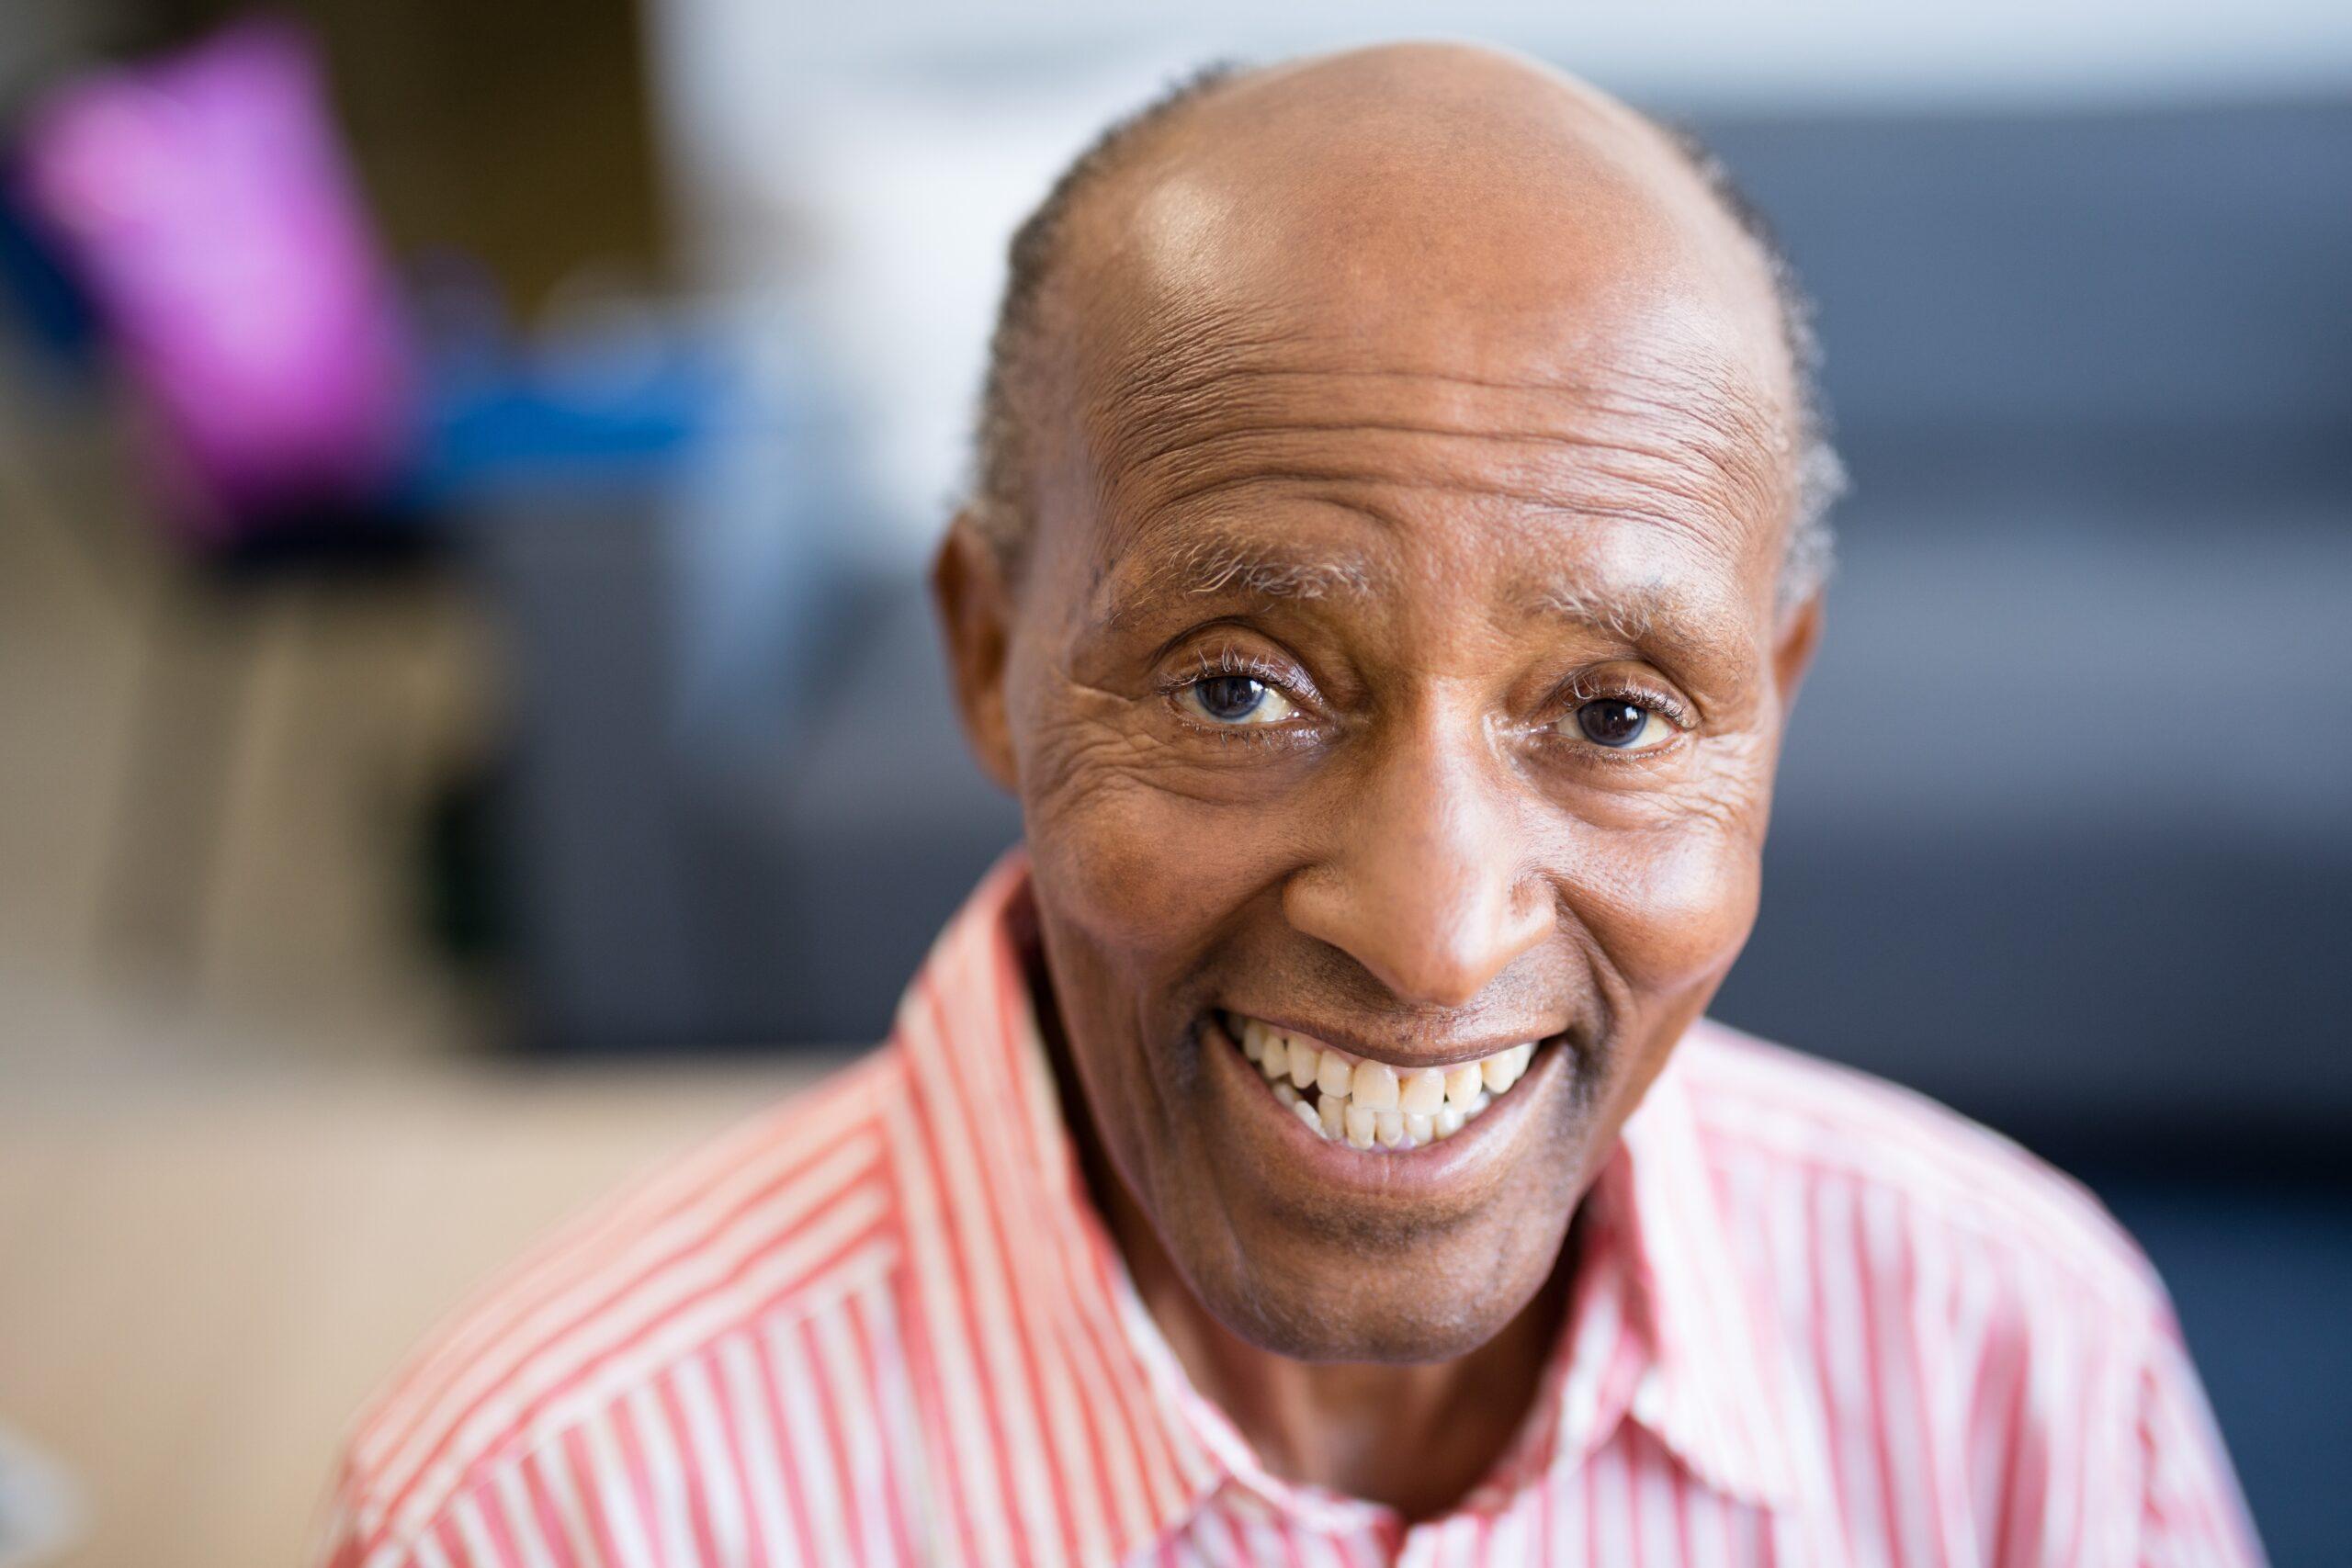 Pension Payout: Lump Sum Dilemma